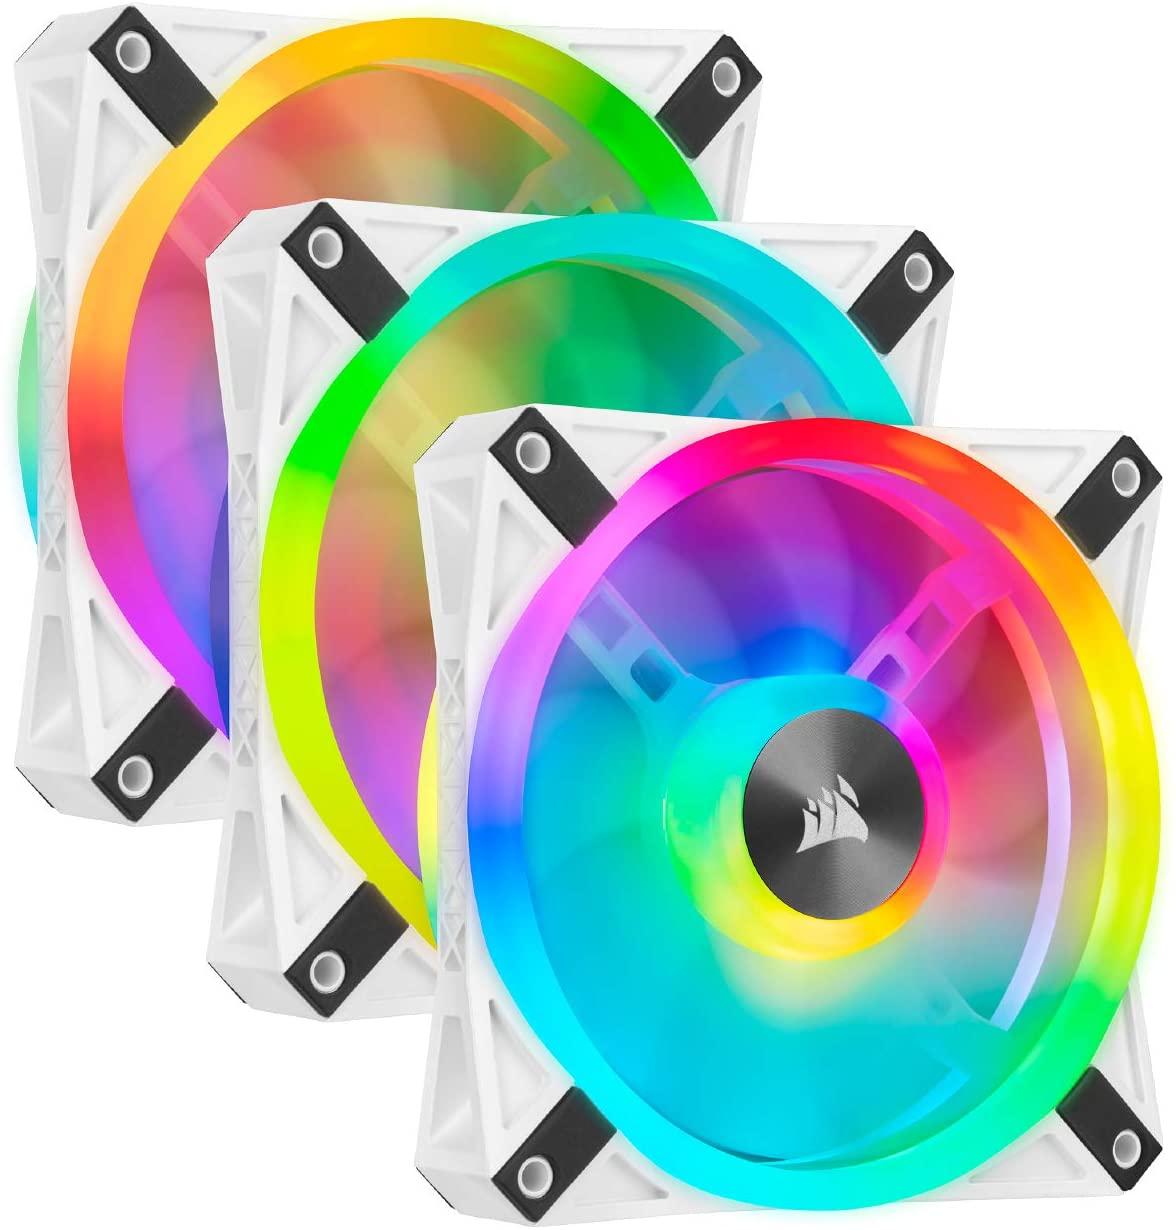 Corsair QL Series, iCUE QL120 RGB, 120mm RGB LED PWM White Fan, Triple Fan Kit with Lighting Node Core $105.99 normally $139.99(save $34.00 24% off)